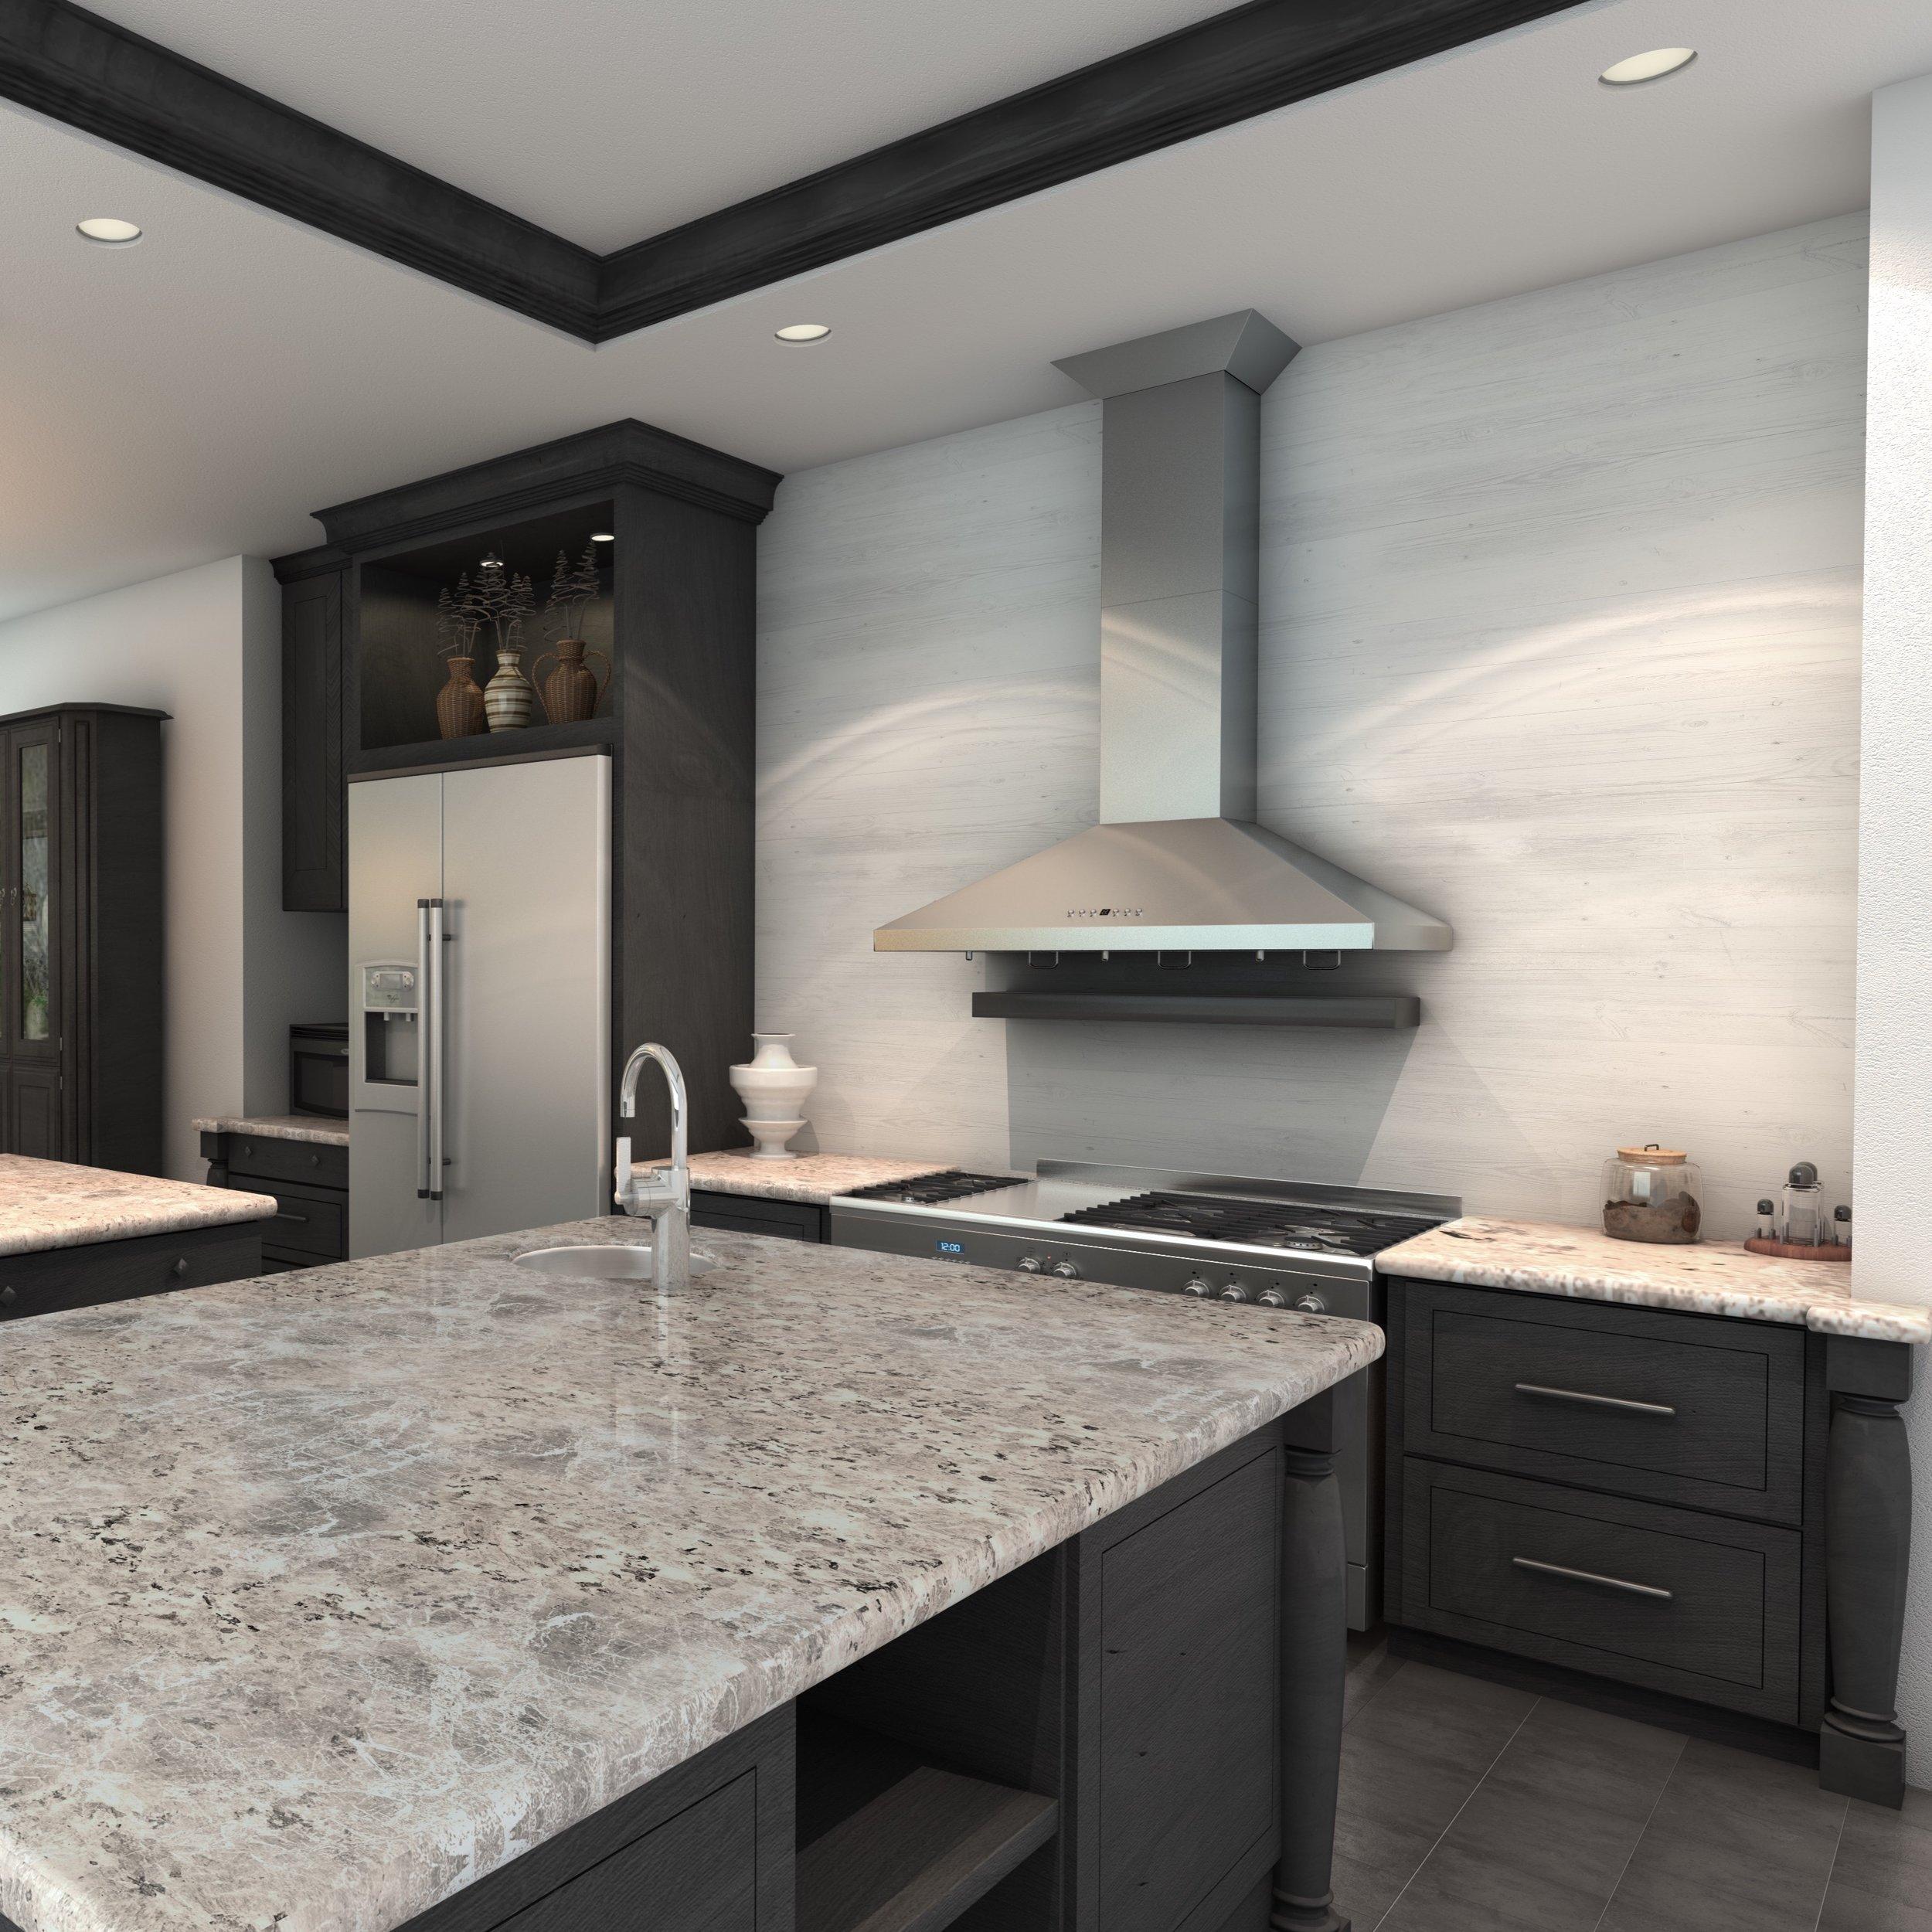 zline-stainless-steel-wall-mounted-range-hood-KL2-kitchen 2.jpeg